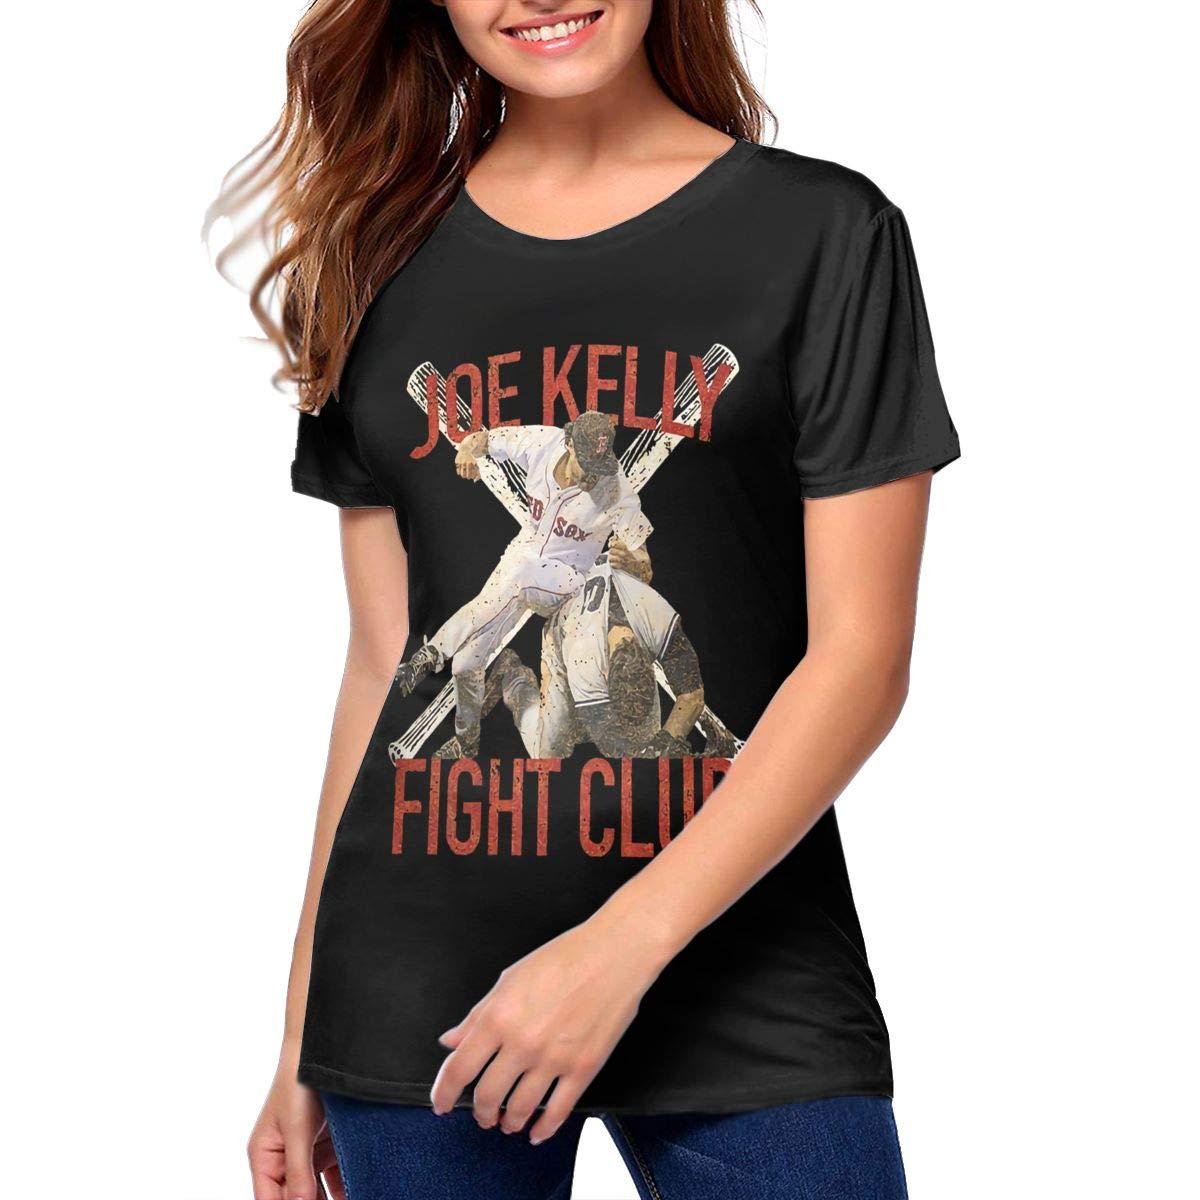 Tammyrlewis Women S Joe Kelly Fight Boston Baseball Club Casual Fashion S Black Shirts